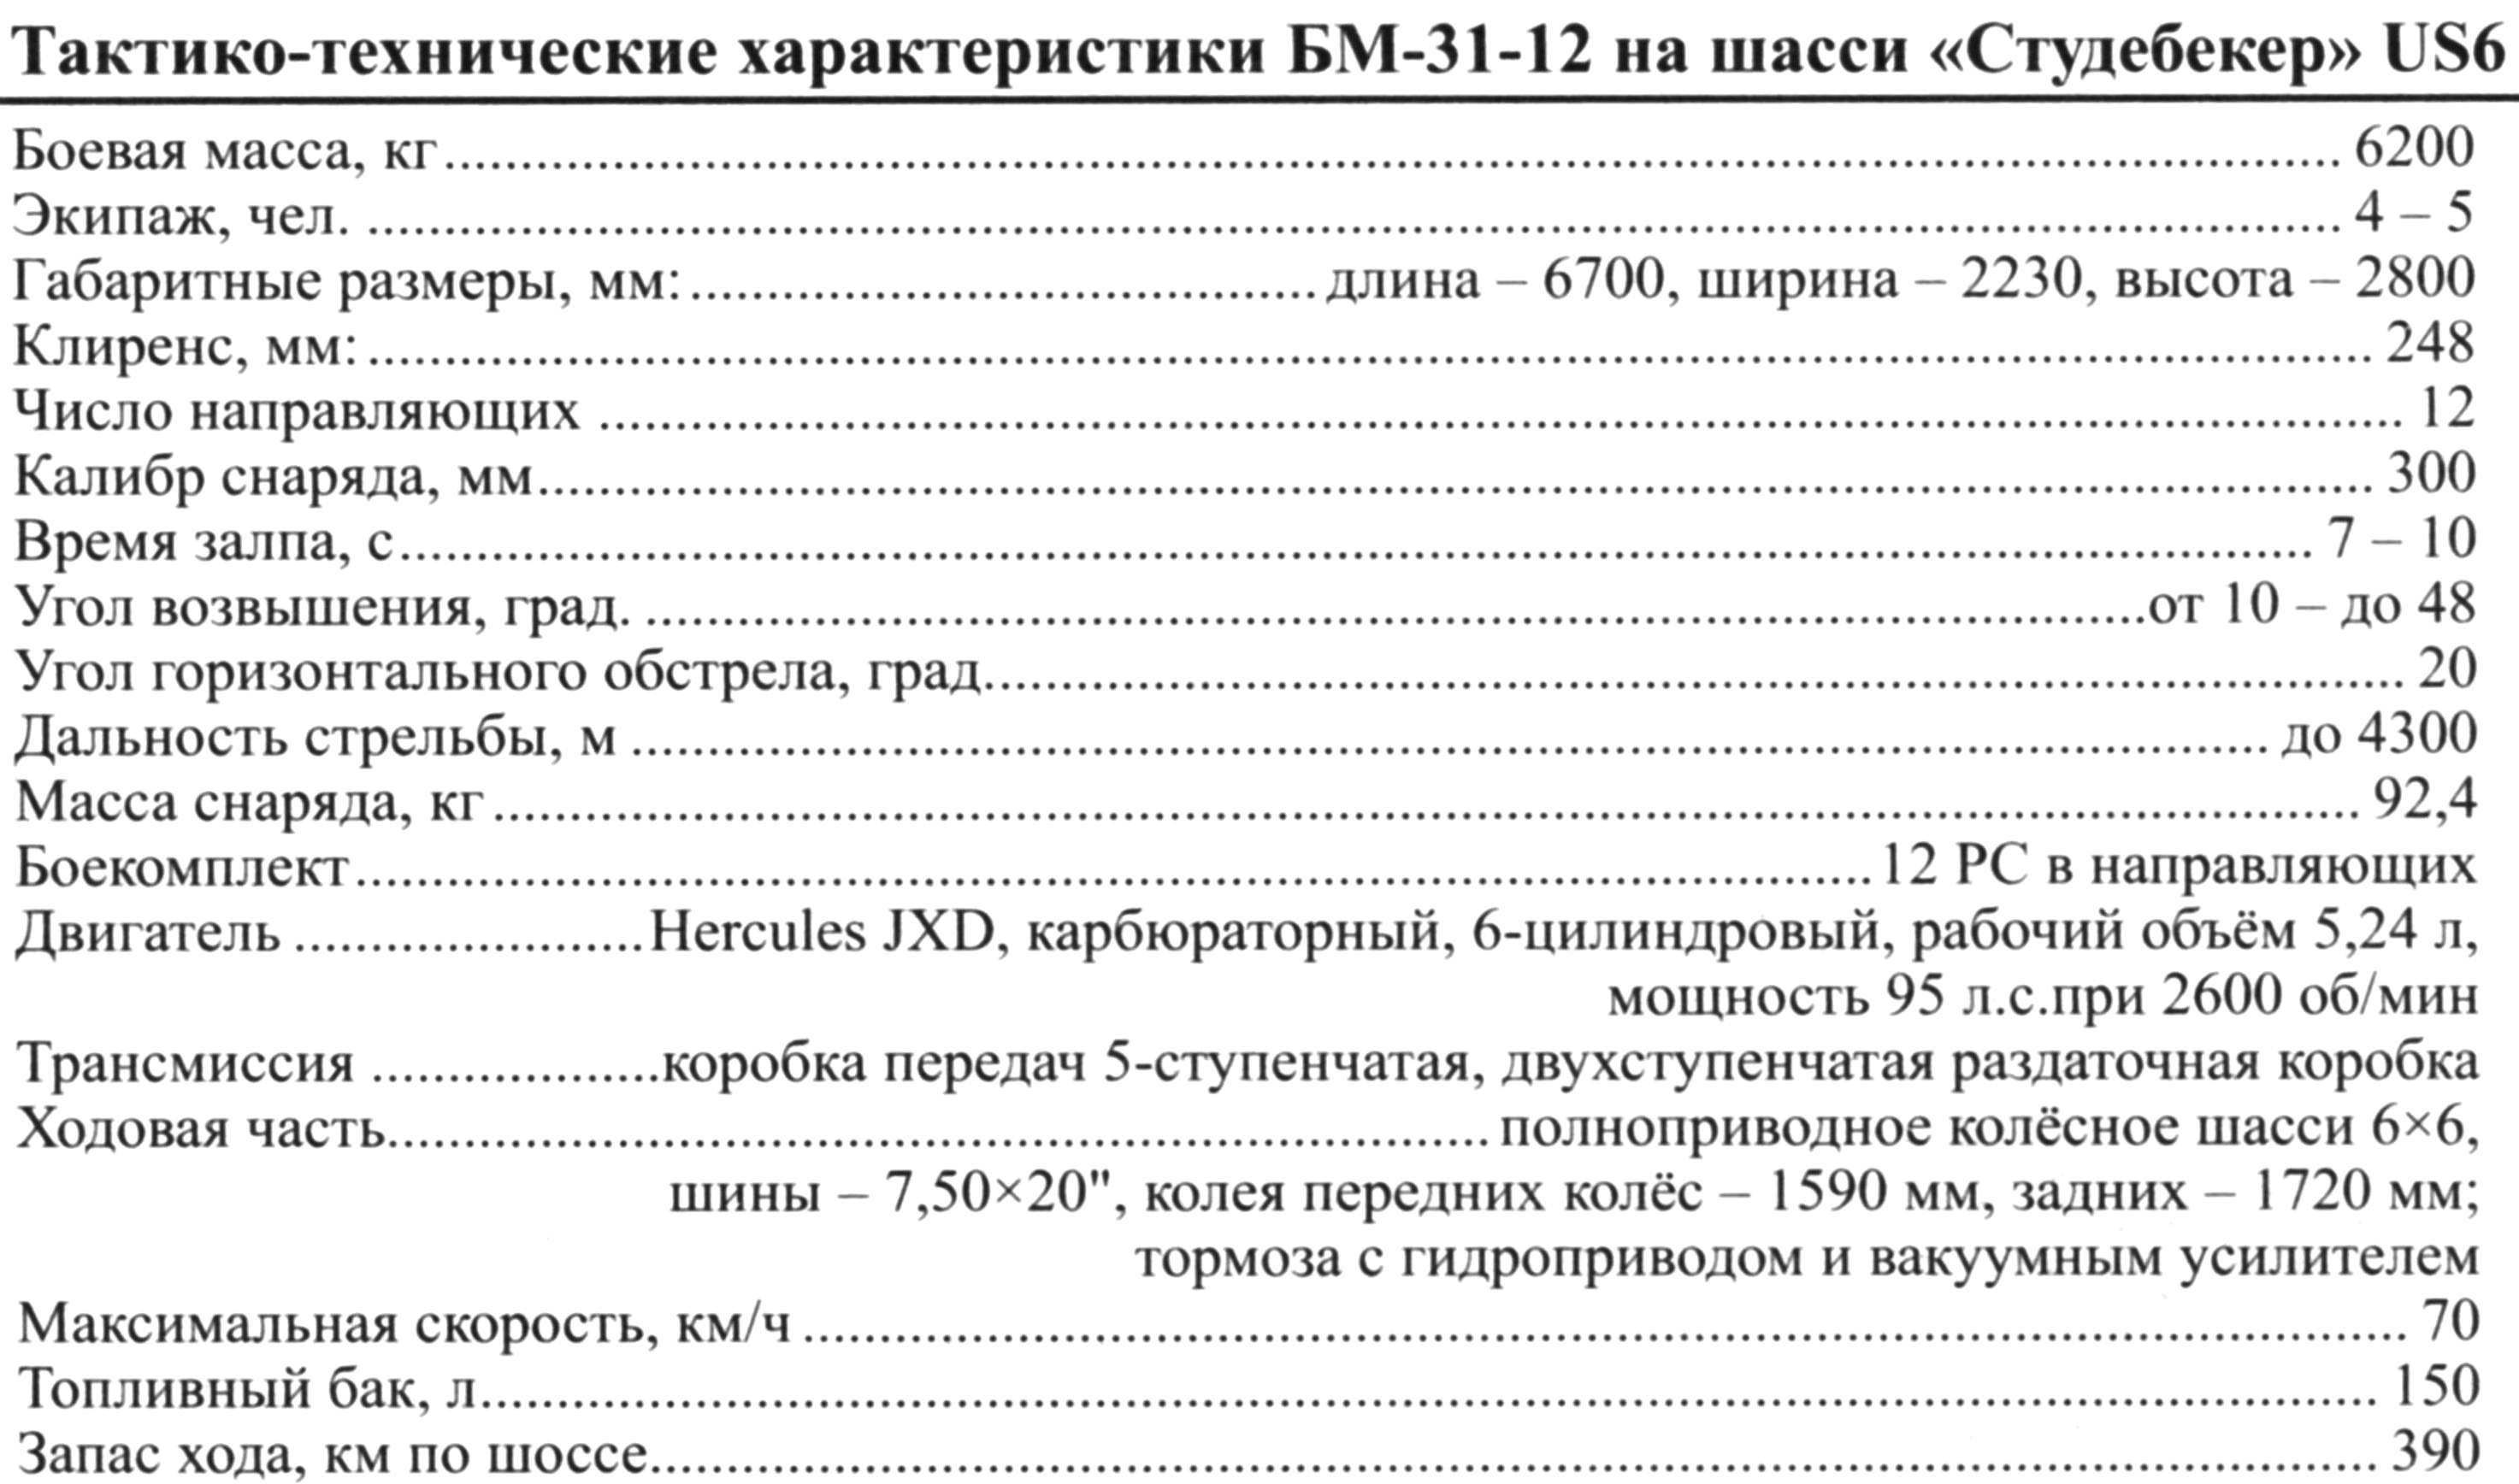 Тактико-технические характеристики БМ-31-12 на шасси «Студебекер» US6